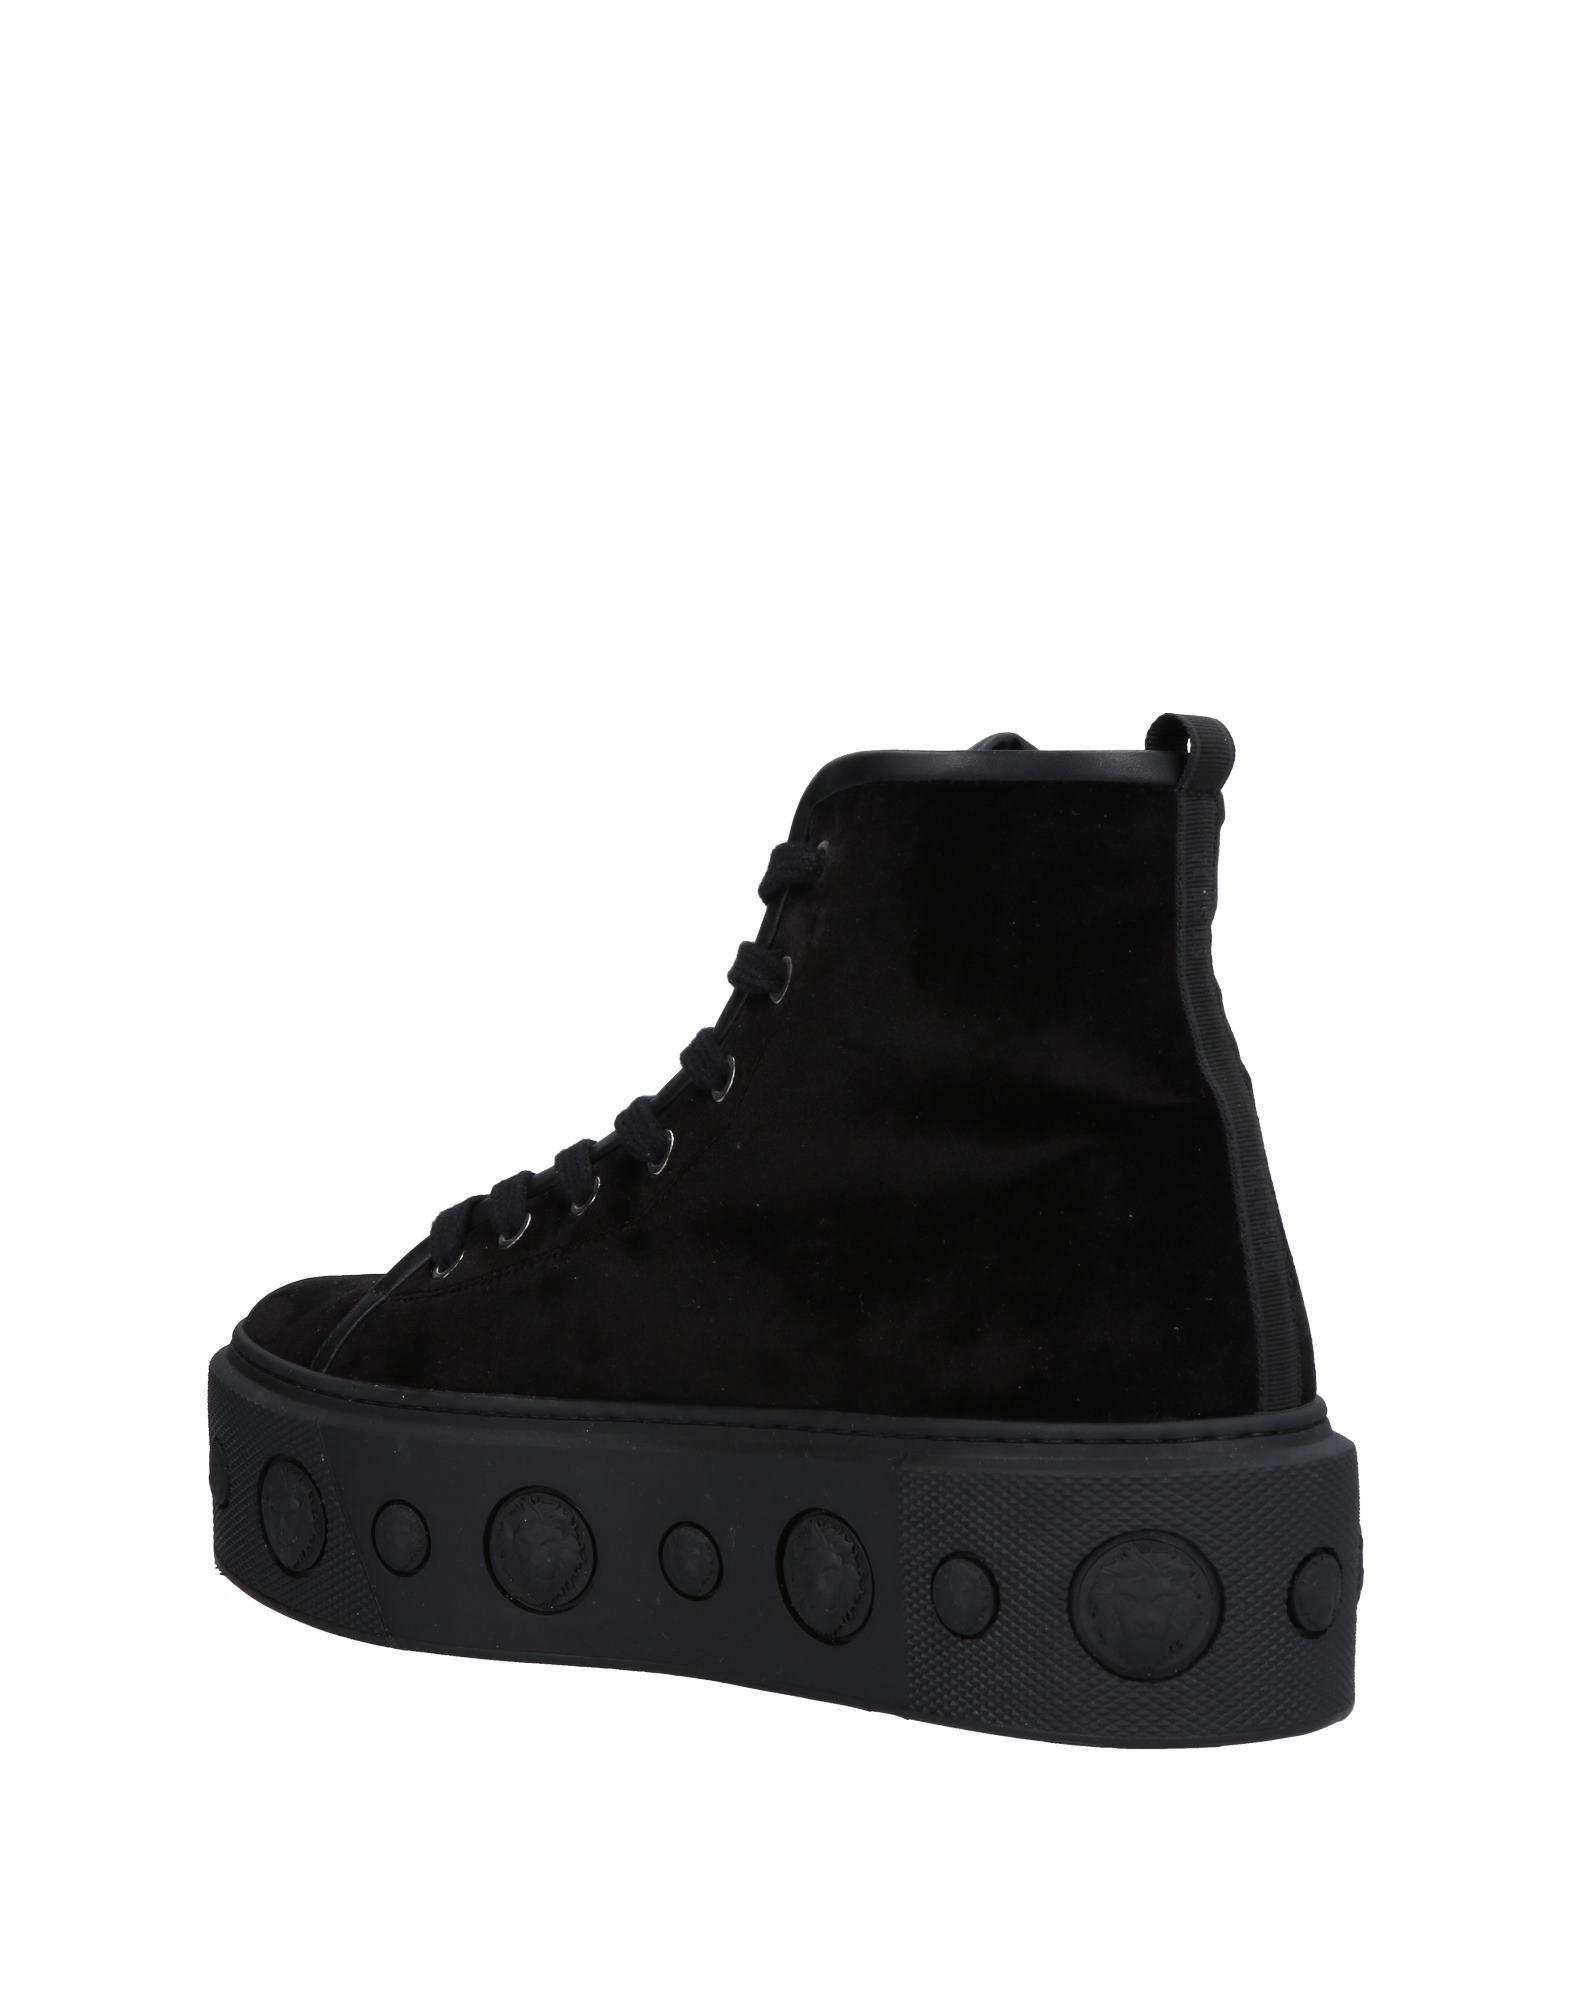 Versus Velvet High-tops & Sneakers in Black